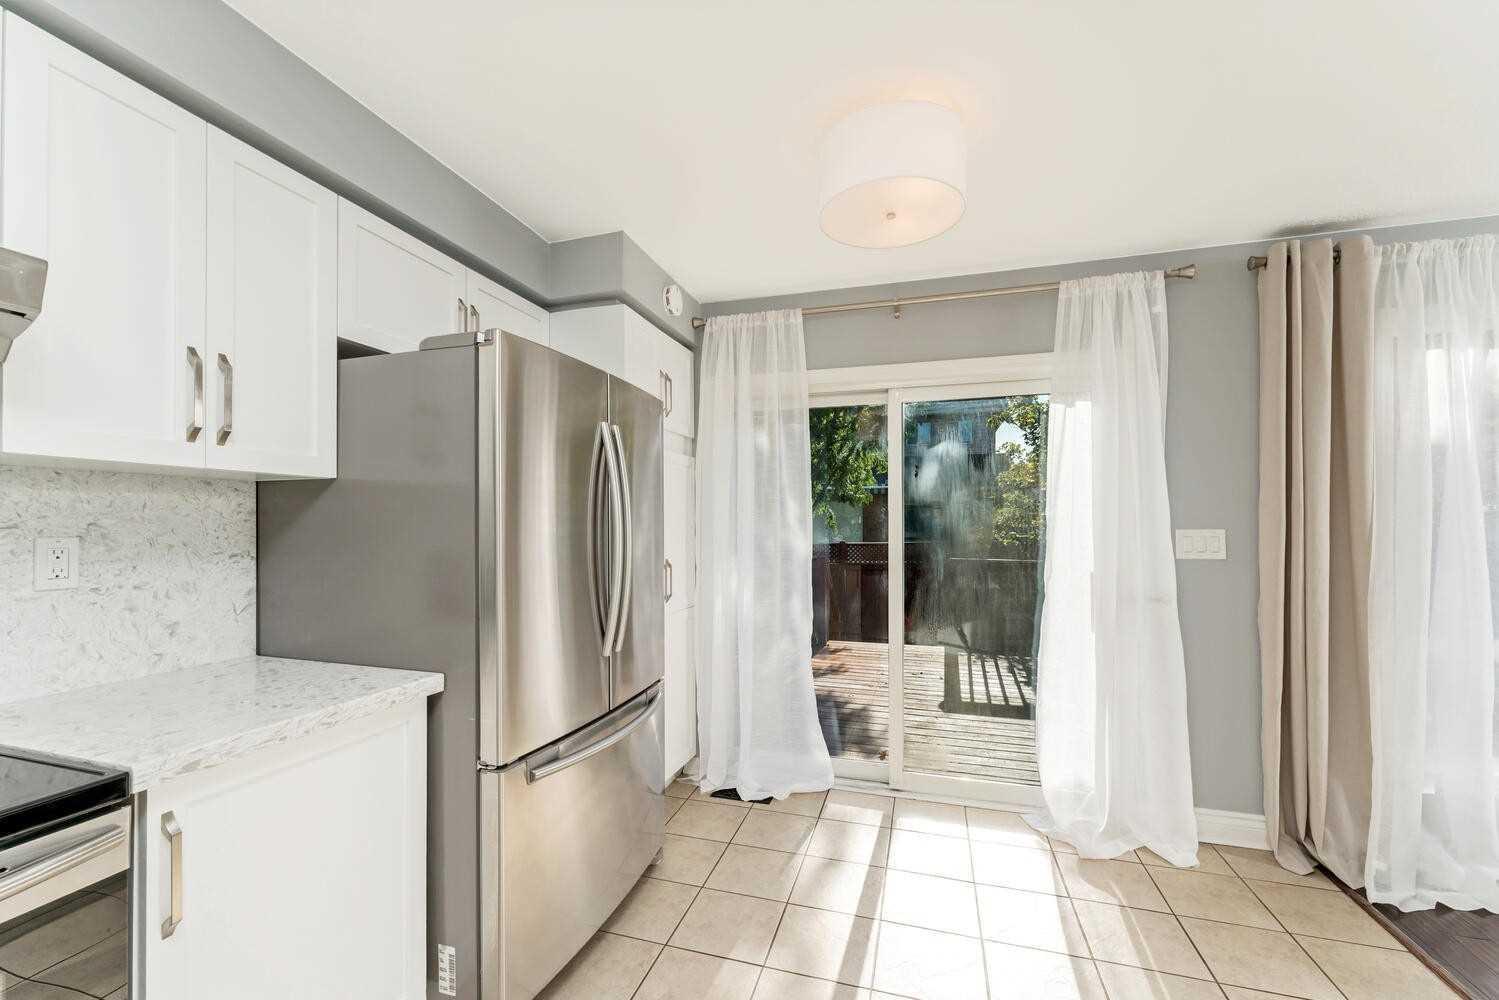 1030 Barclay Circ - Beaty Att/Row/Twnhouse for sale, 3 Bedrooms (W5400435) - #11